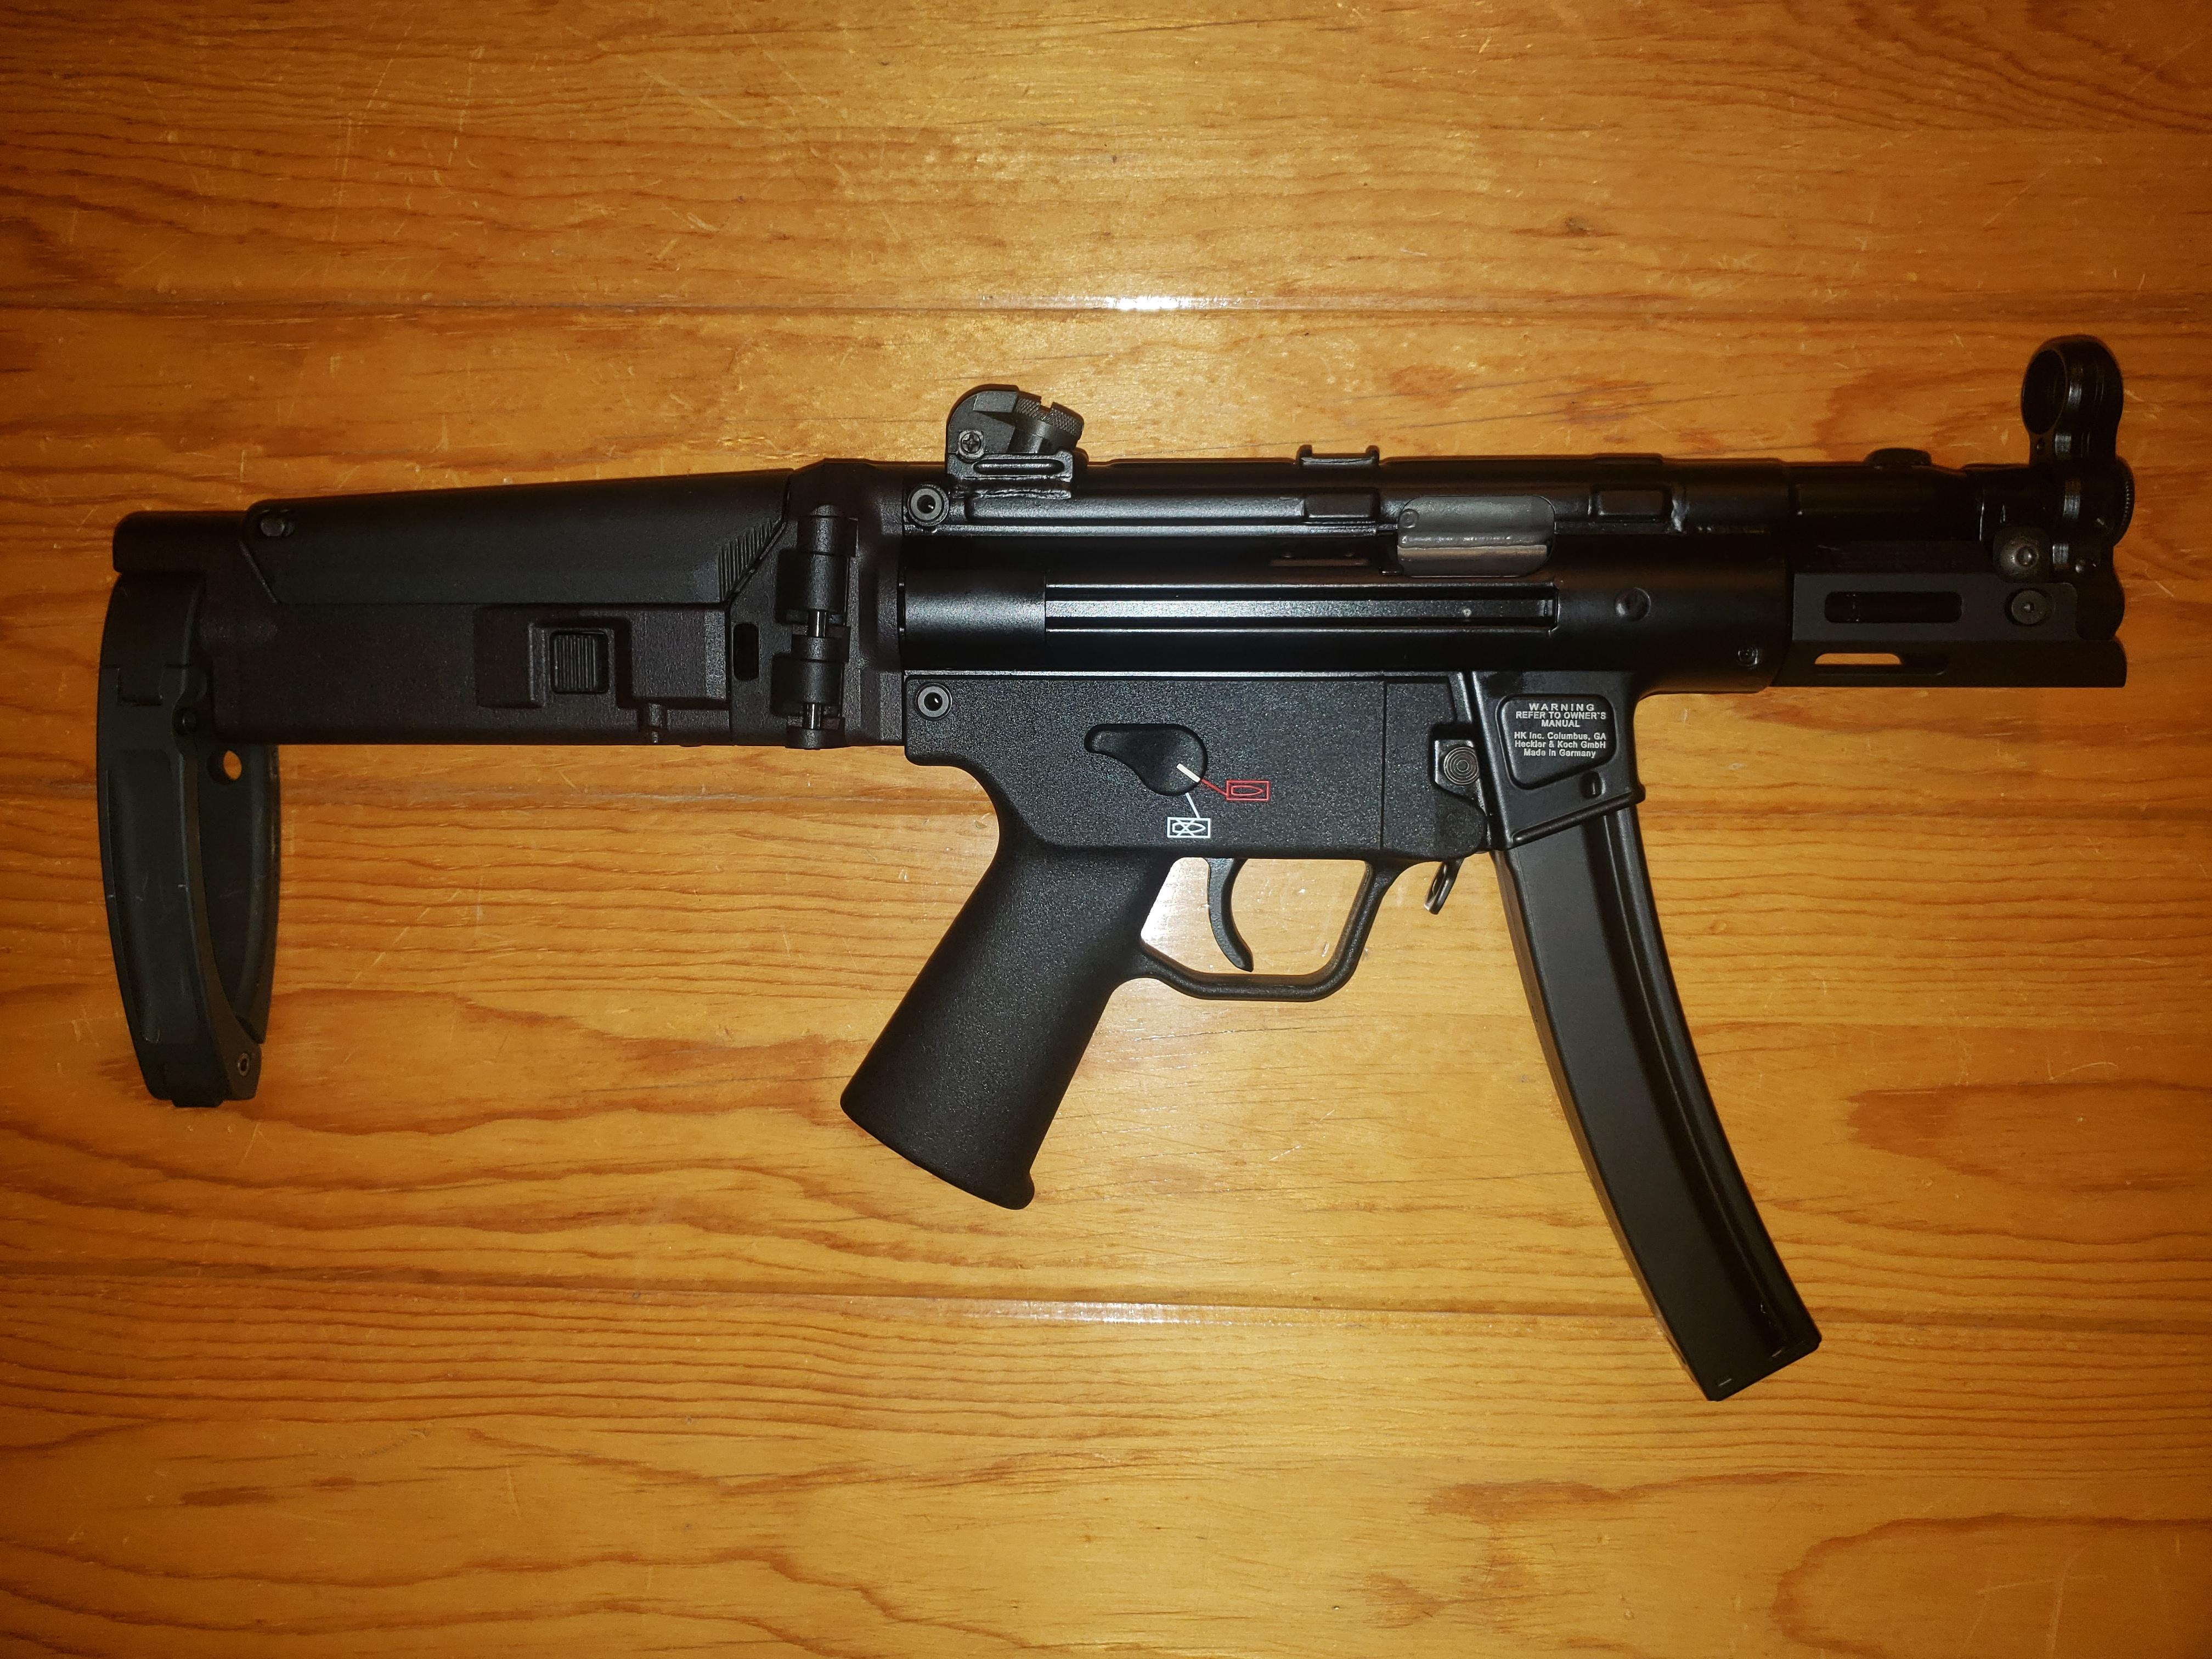 MP5 ACR Stock Adaptors In Production-20200226_182028_1582760059487.jpg